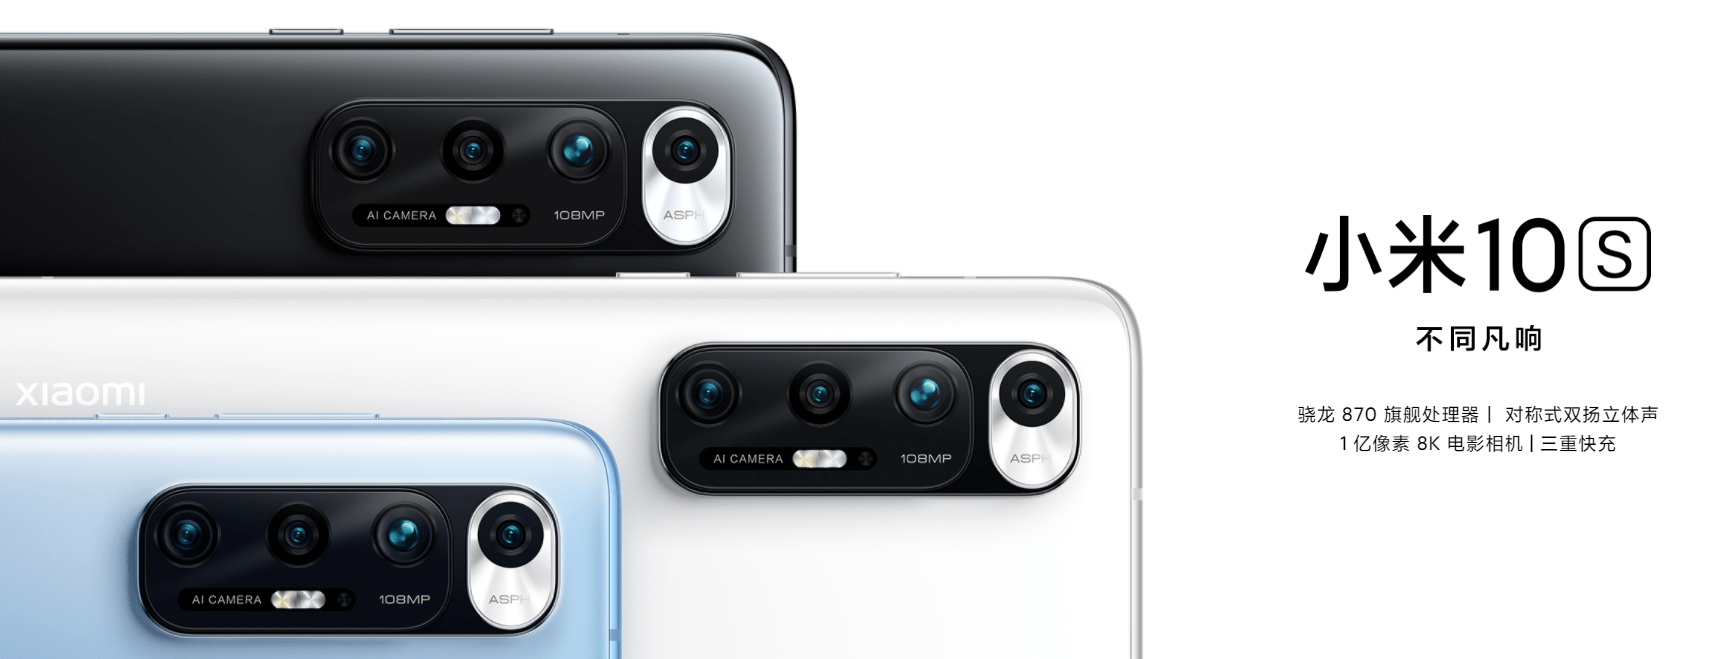 Snapdragon 870 5GのAnTuTu Benchmarkスコアが判明。VS. Snapdragon 888 5G、865 Plus 5G、865 5G